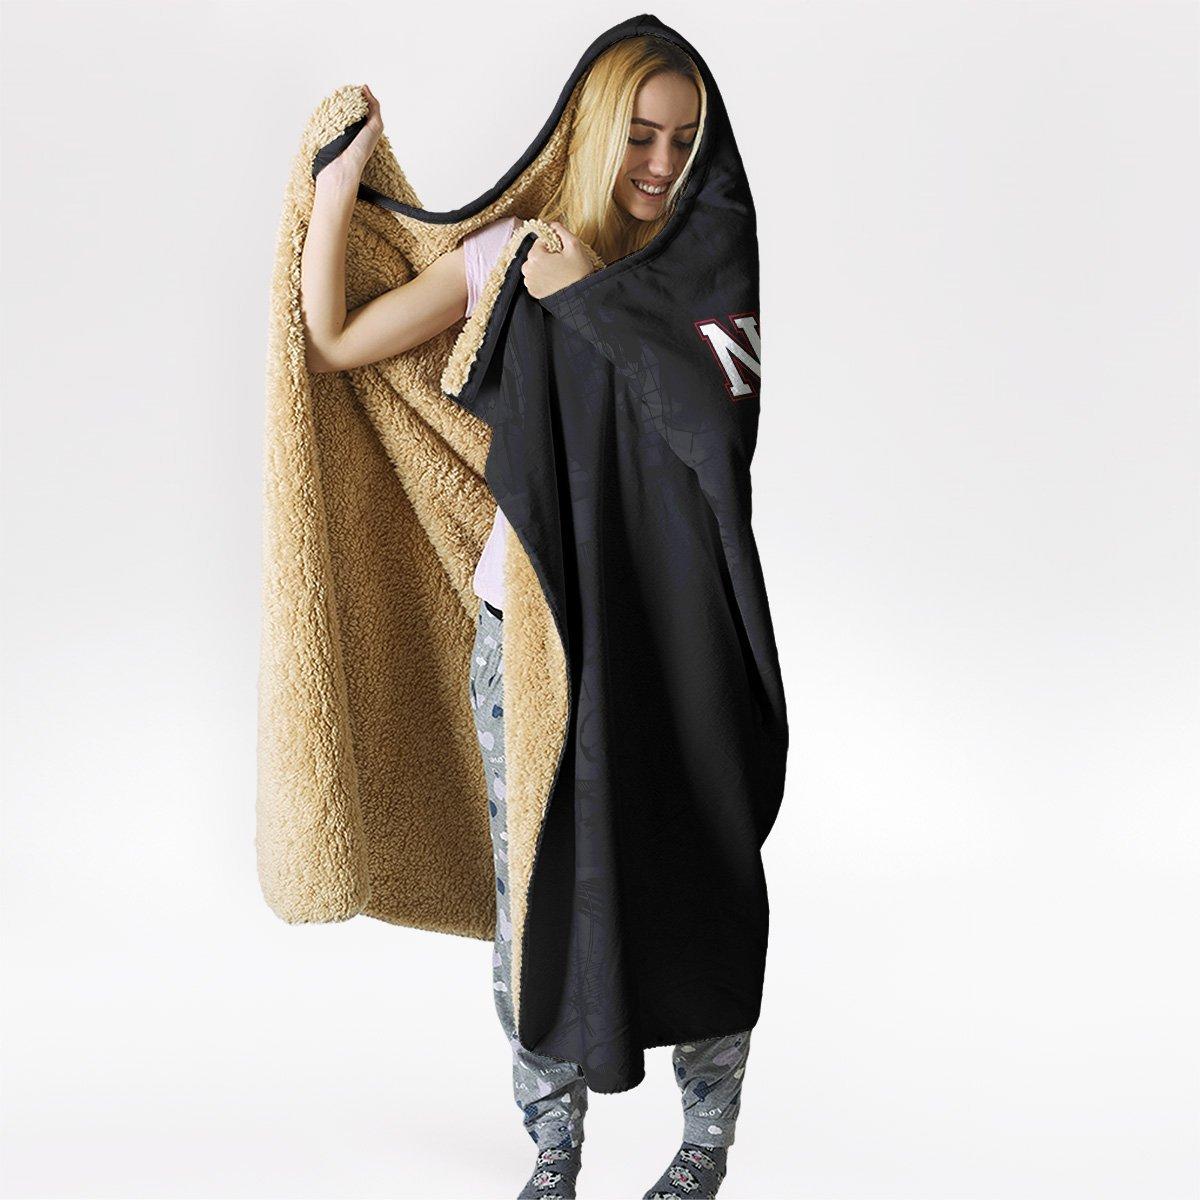 nekoma volleyball club hooded blanket 830535 - Otaku Treat